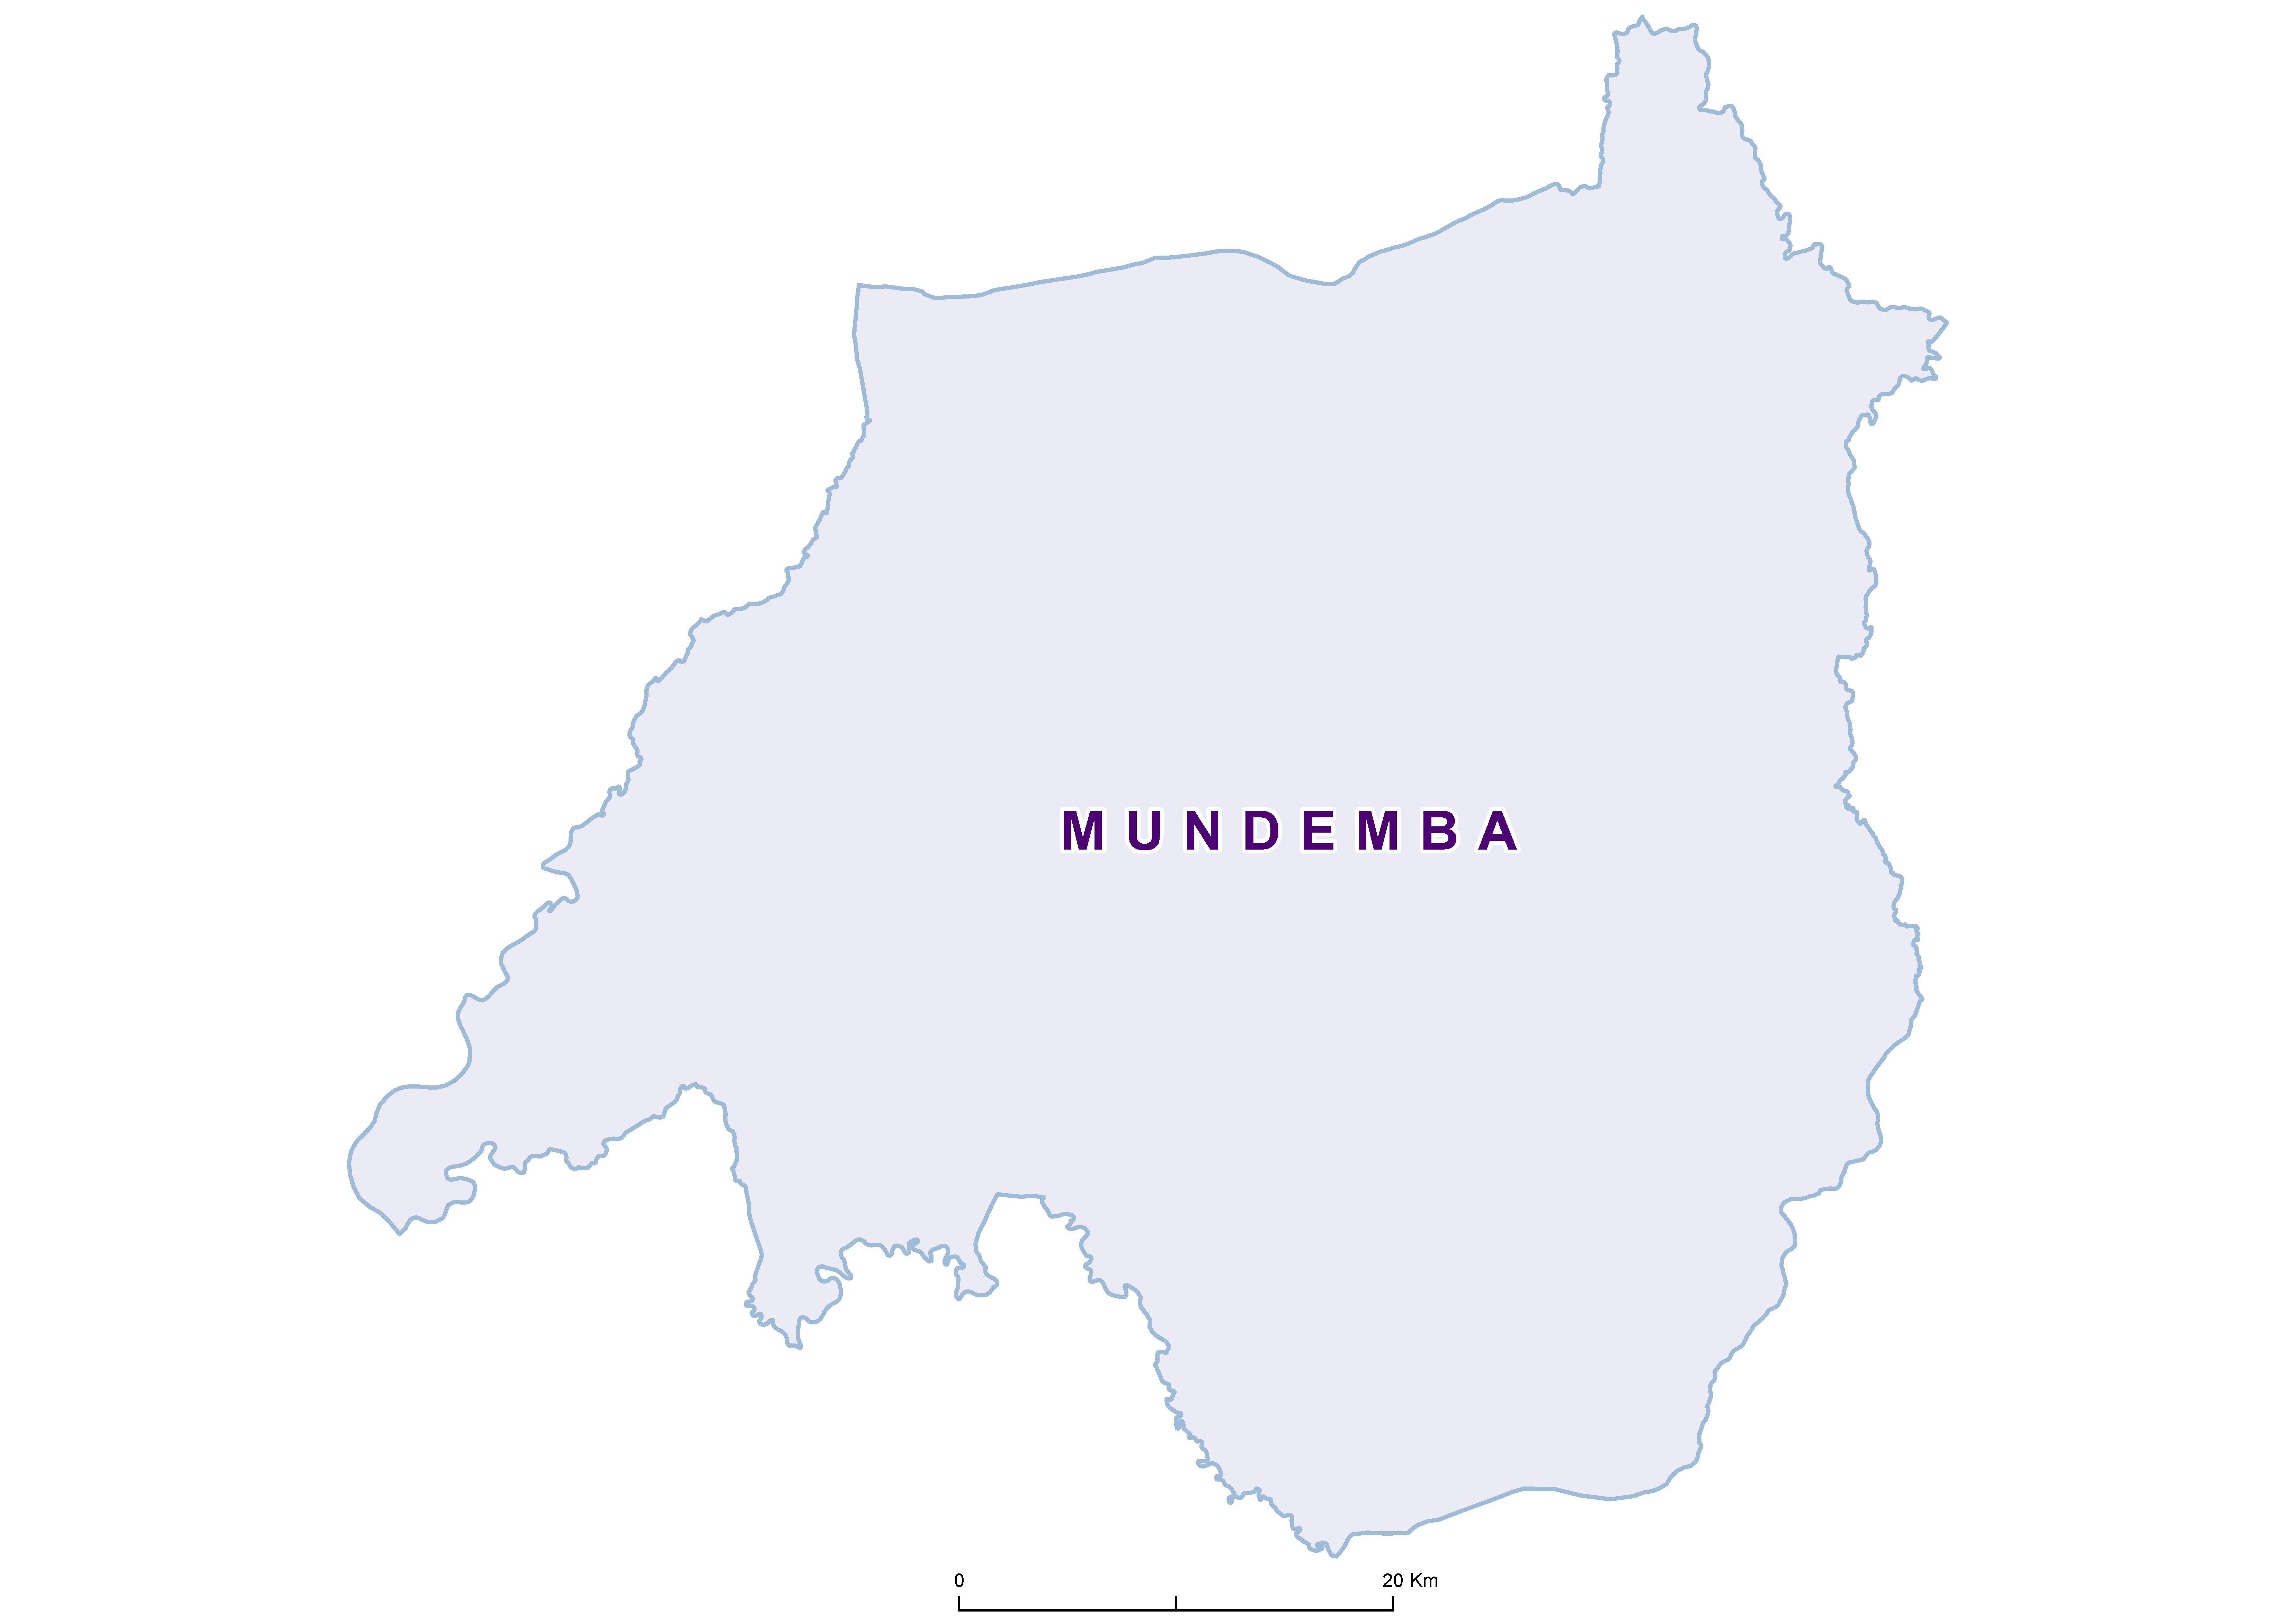 Mundemba Mean STH 19850001